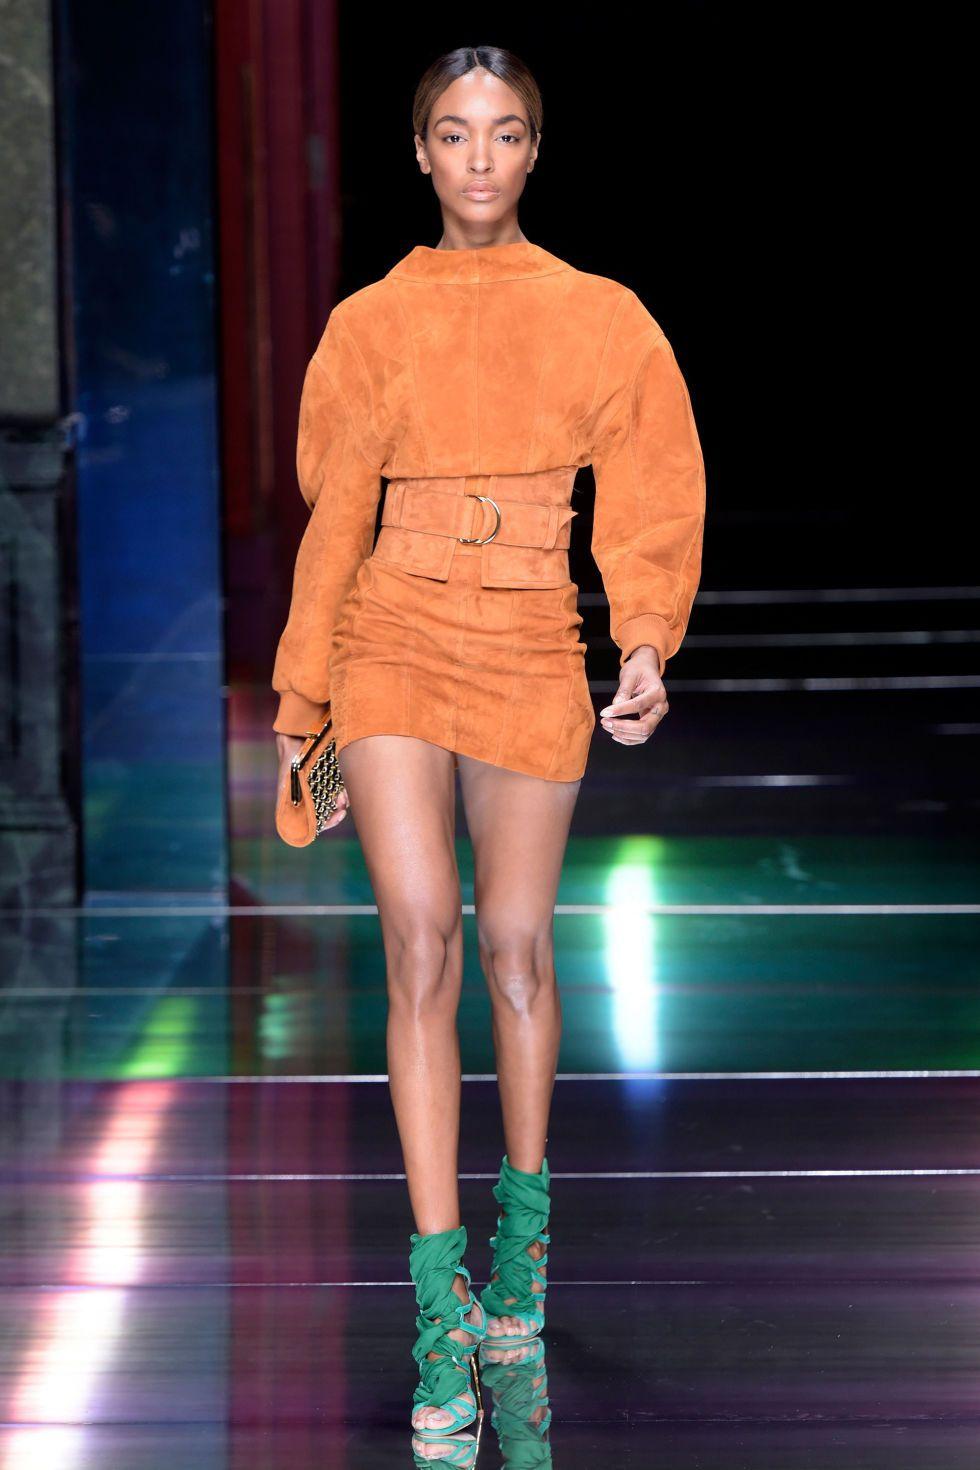 Kendall Jenner Paris Fashion Week - Balmain SS16 | Kendall